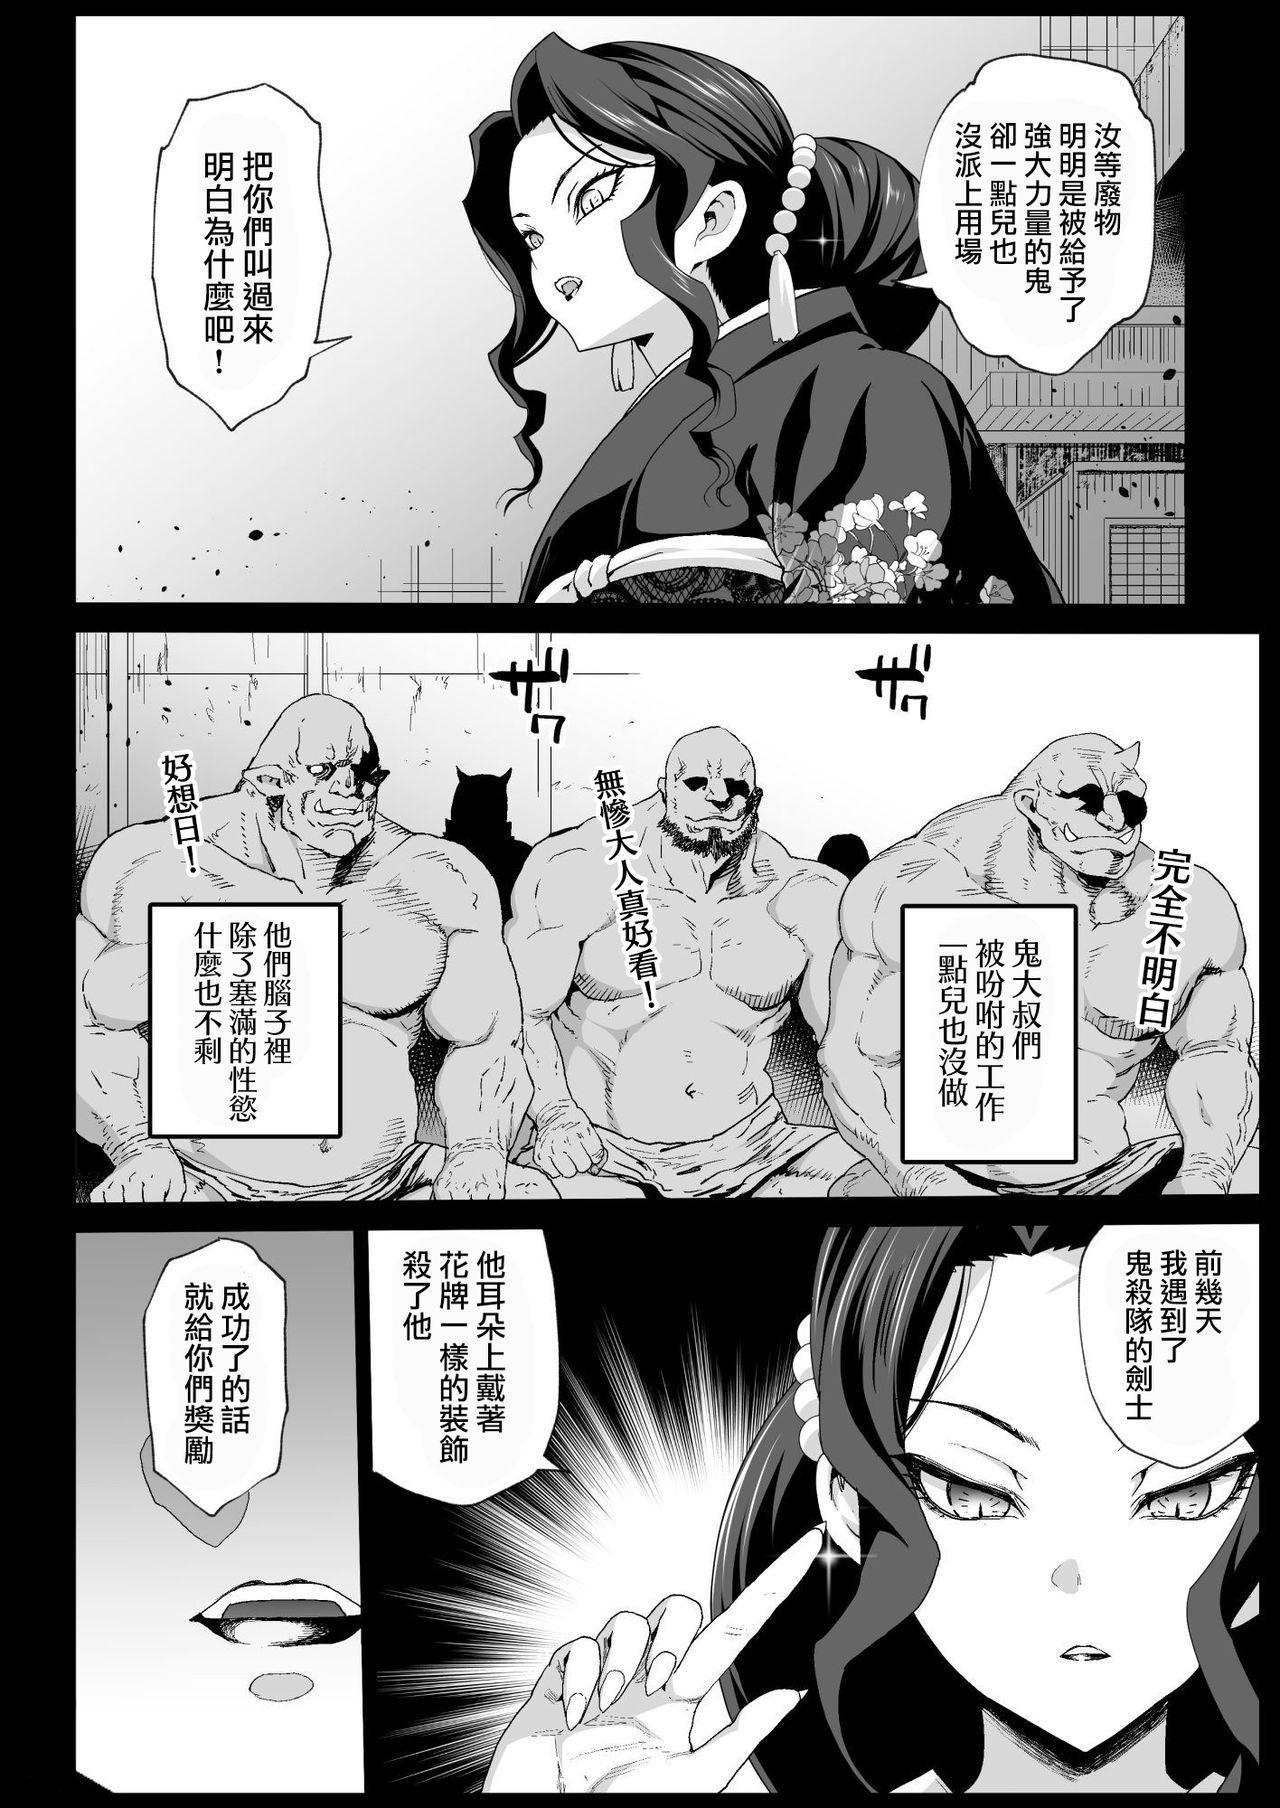 Eromazun (Ma-kurou)] Mesu Ochi Jou Muzan-sama - RAPE OF DEMON SLAYER 4 (Kimetsu no Yaiba) [Chinese] [瑞树汉化组&BW重嵌] [Decensored] [Digital] 6